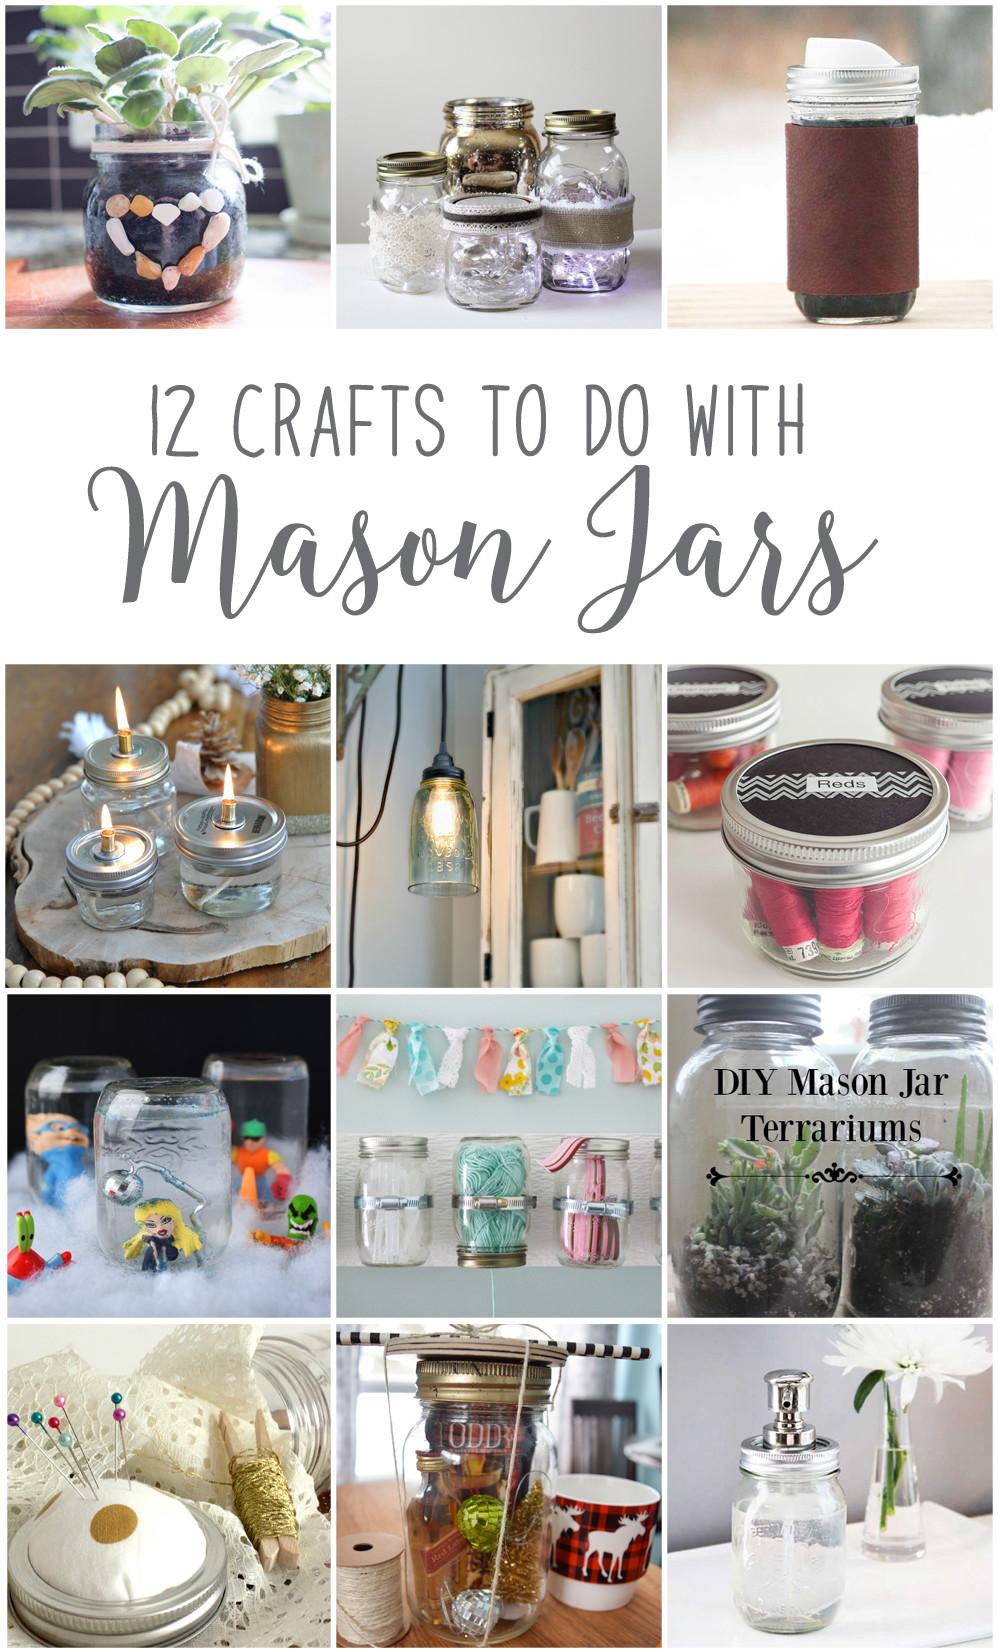 Best ideas about Mason Jar Craft Ideas . Save or Pin Make Hanging Mason Jar Craft Storage 12MonthsofDIY Now.